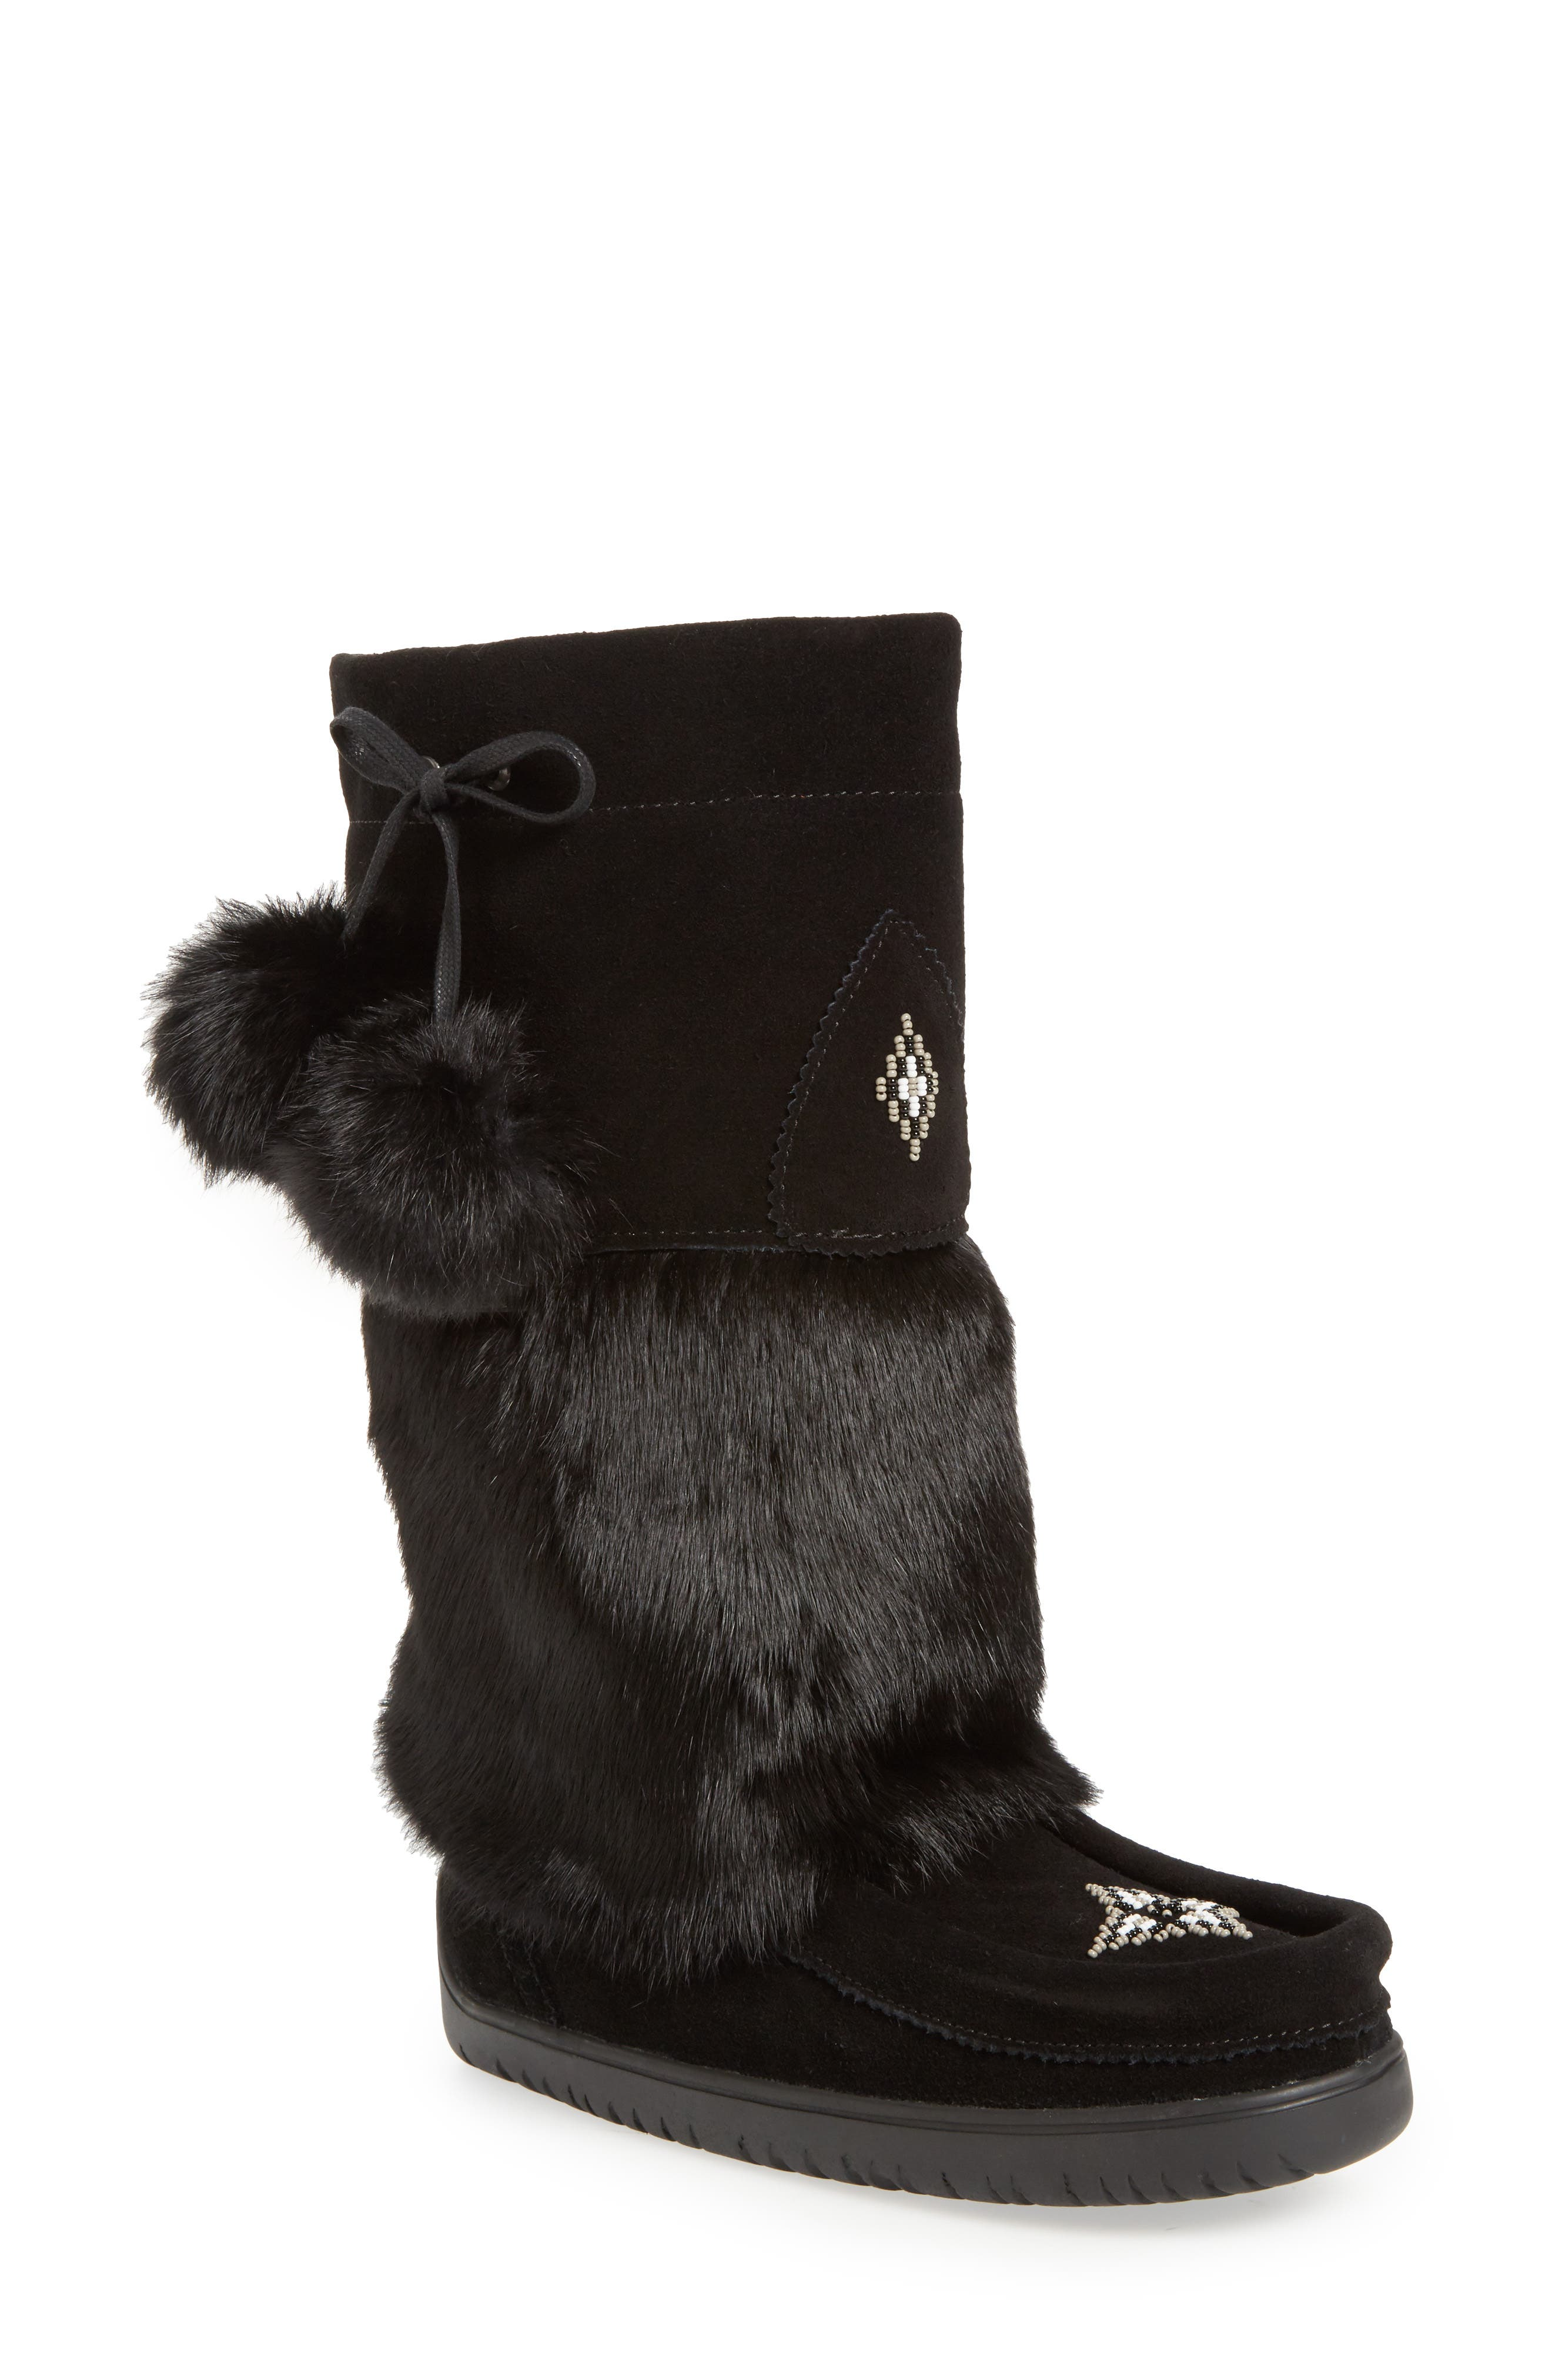 Main Image - Manitobah Mukluks Snowy Owl Waterproof Genuine Fur Boot (Women)